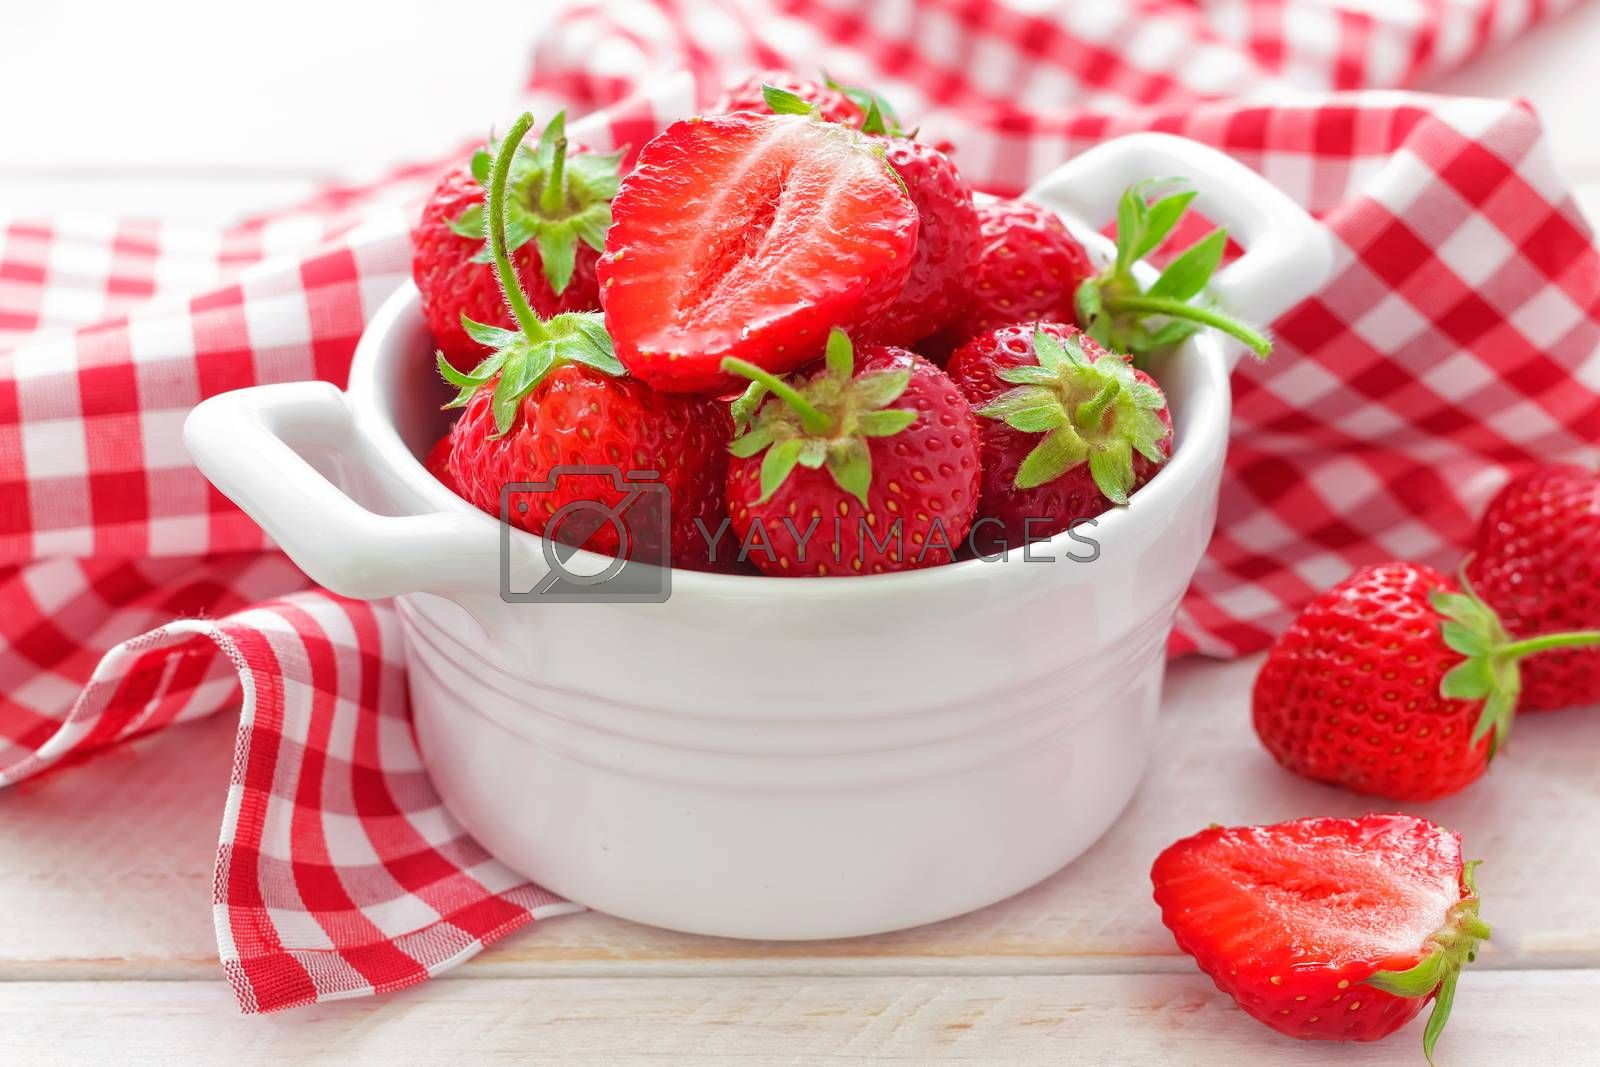 Royalty free image of Strawberry by yelenayemchuk